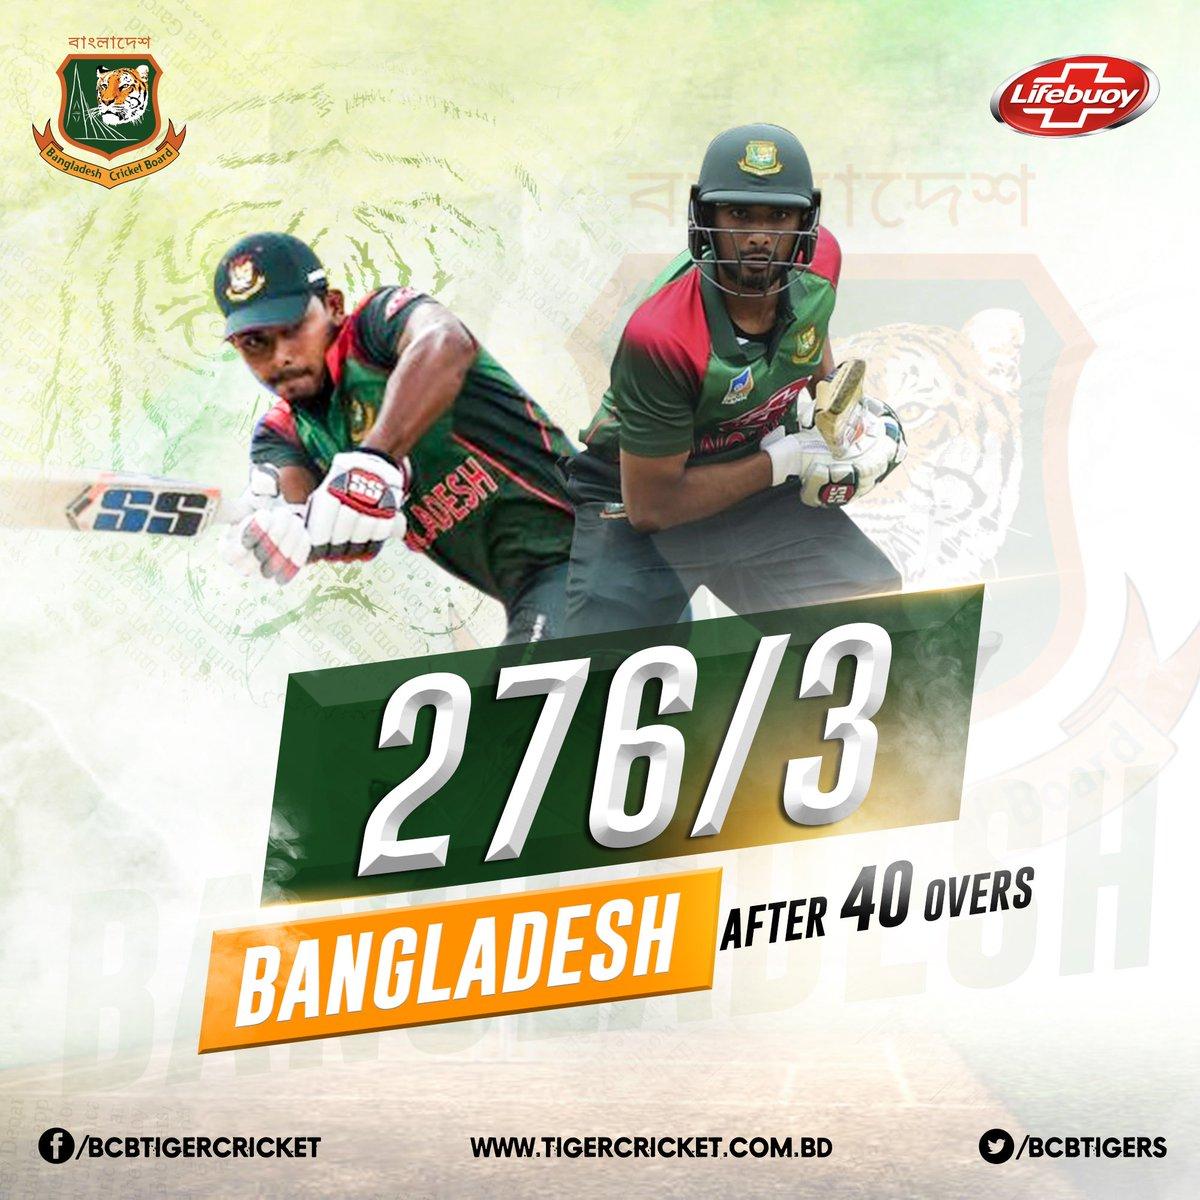 Bangladesh Cricket on Twitter: